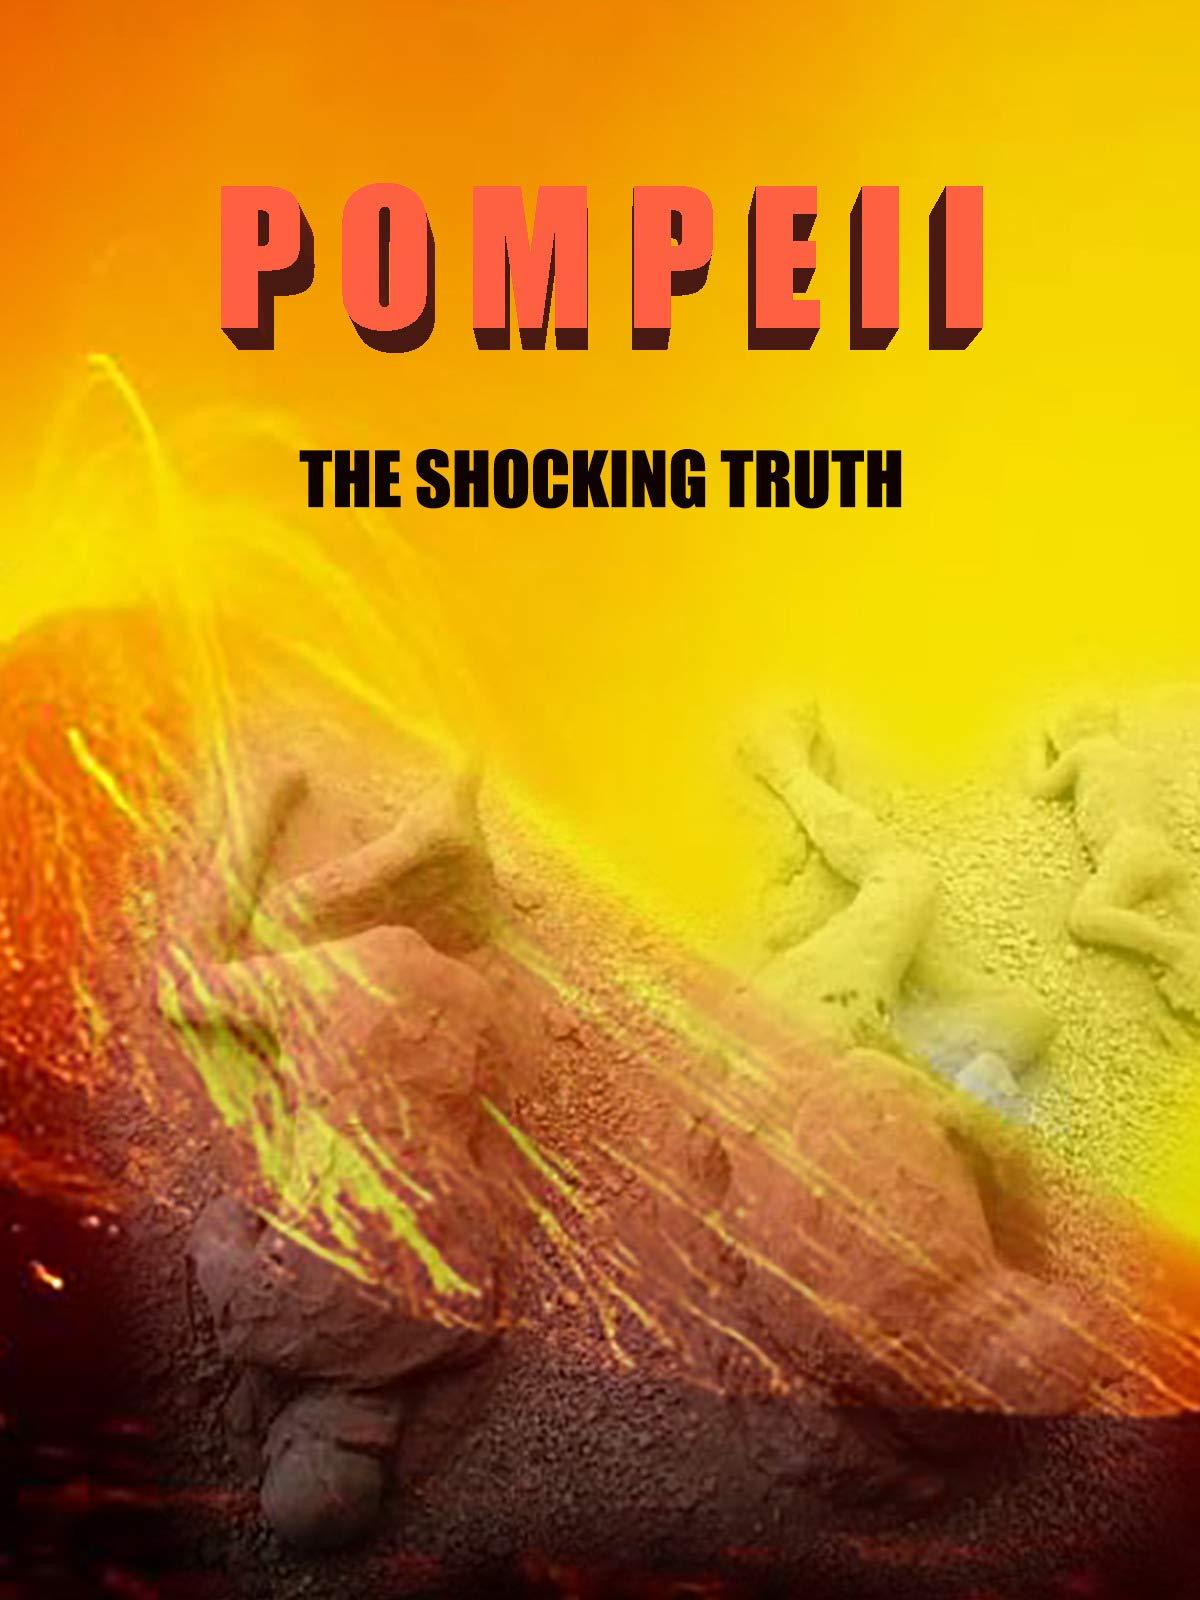 Pompeii The Shocking Truth on Amazon Prime Video UK